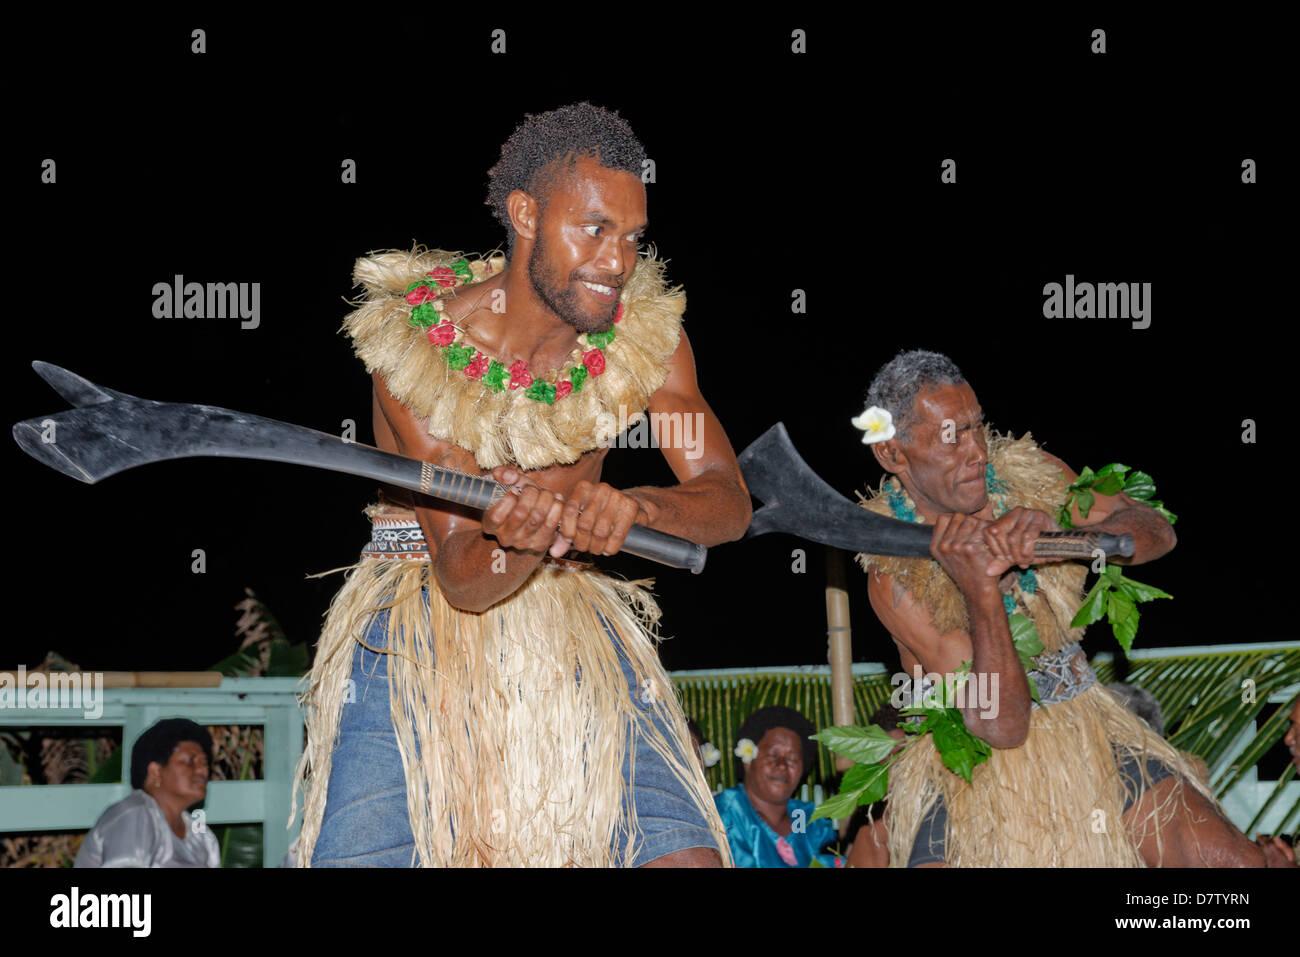 Kava ceremony, Wayaseva island, Yasawa Island group, Fiji, South Pacific islands - Stock Image